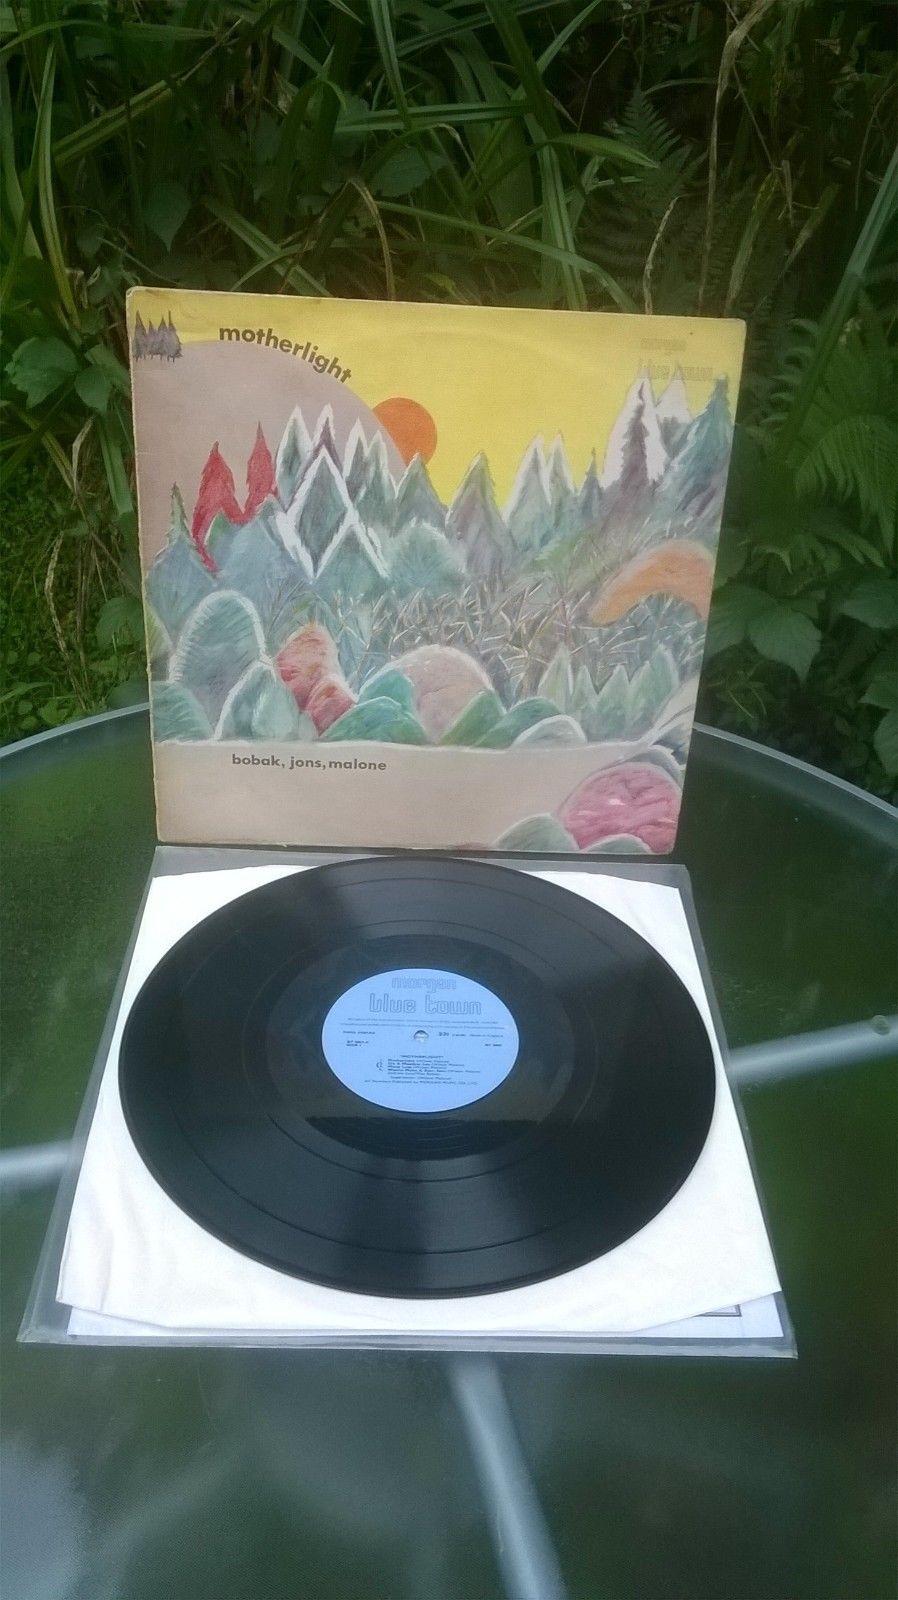 MOTHERLIGHT BOBAK, JONS, MALONE RARE MORGAN BLUE TOWN LP BT 5003 N/M / V/G+